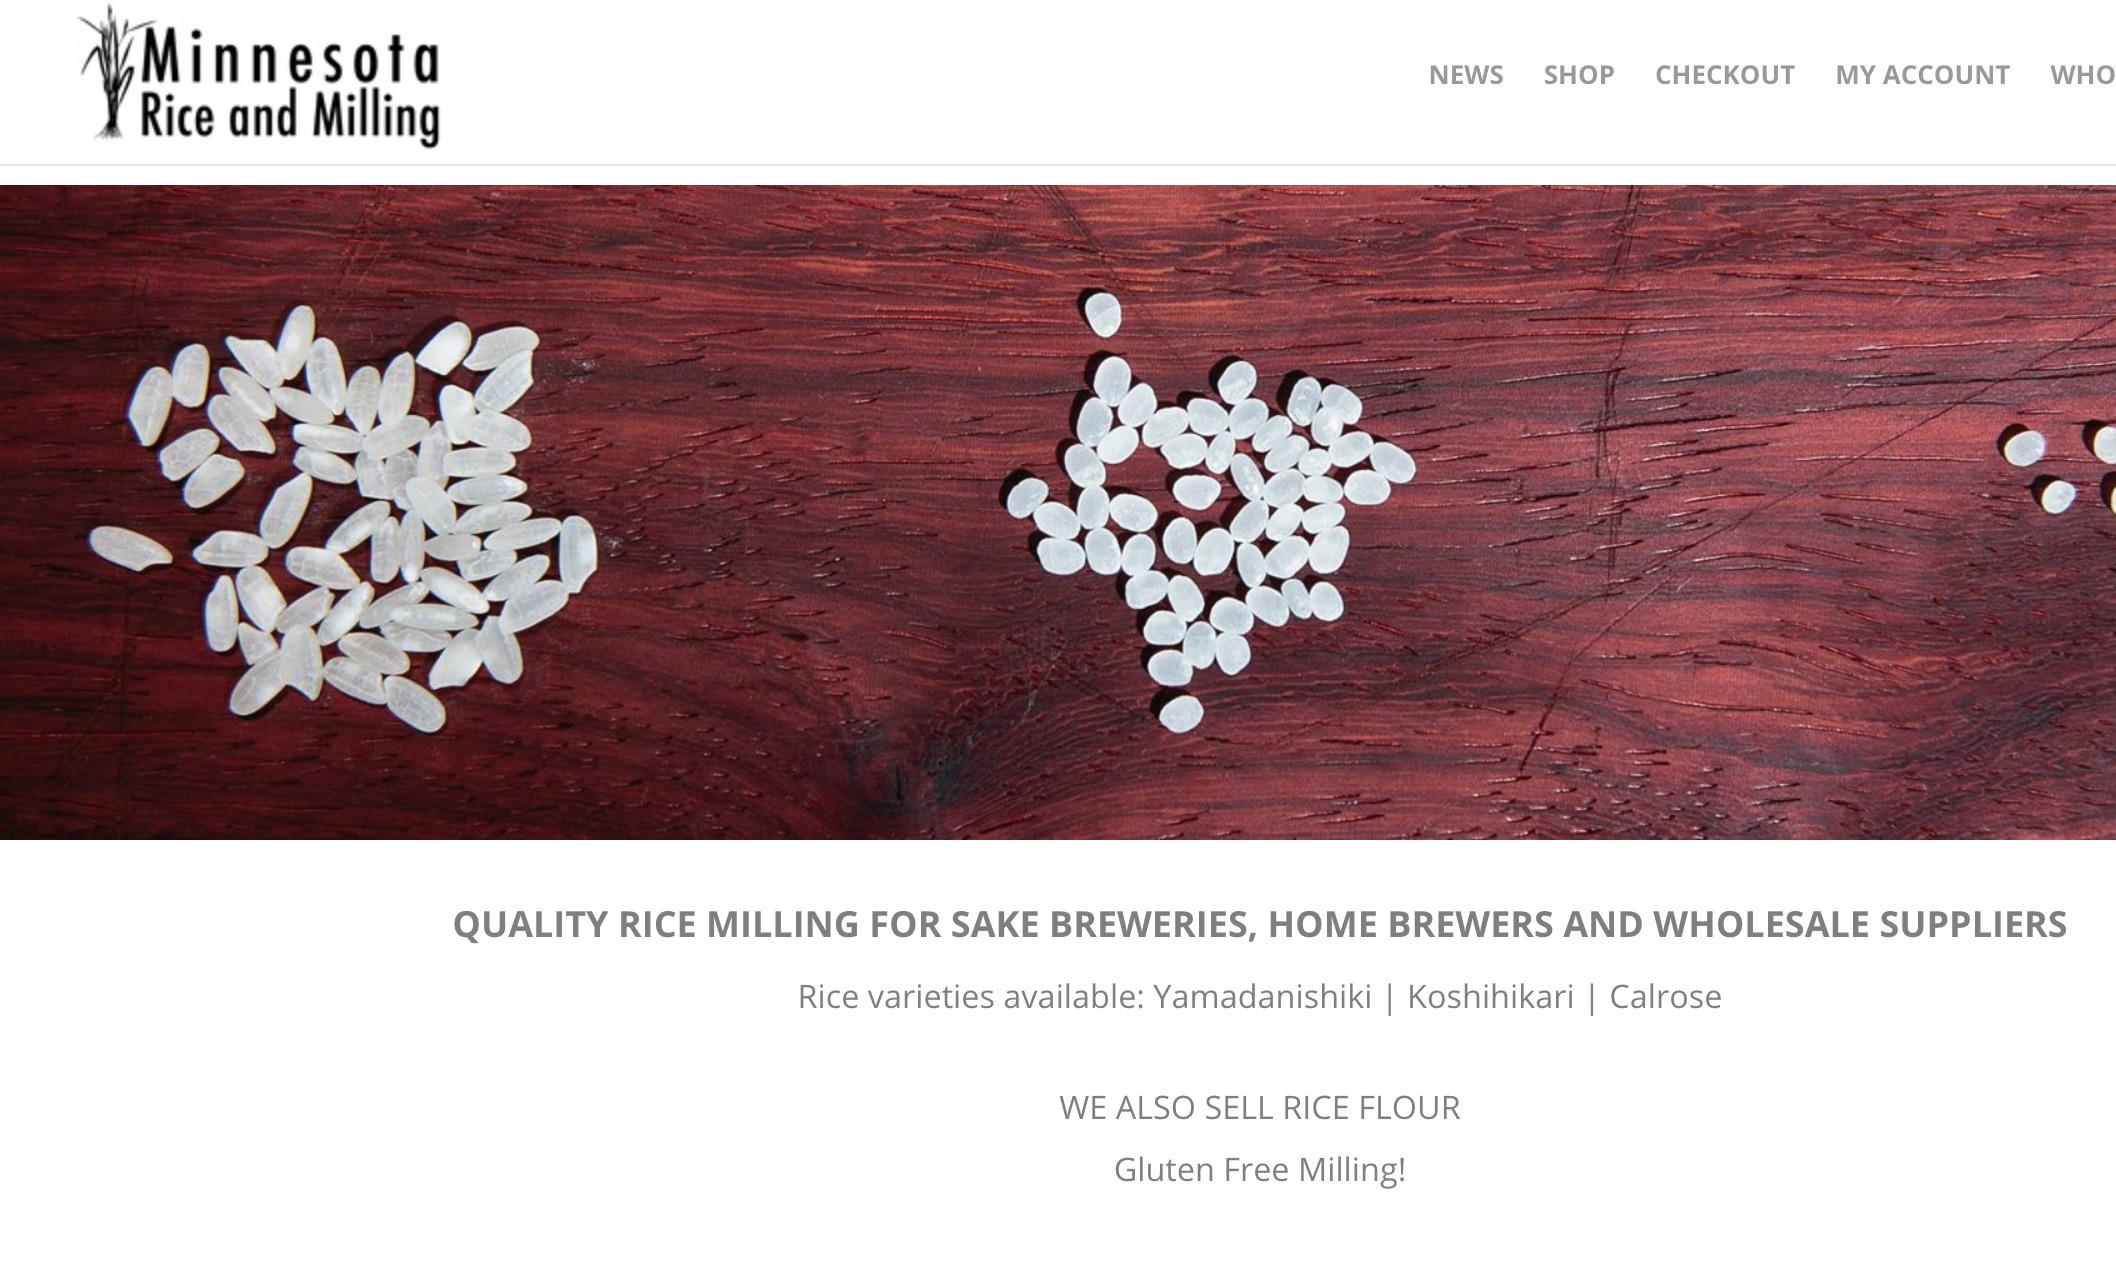 Minnesota Rice and Milling Screenshot.jpg